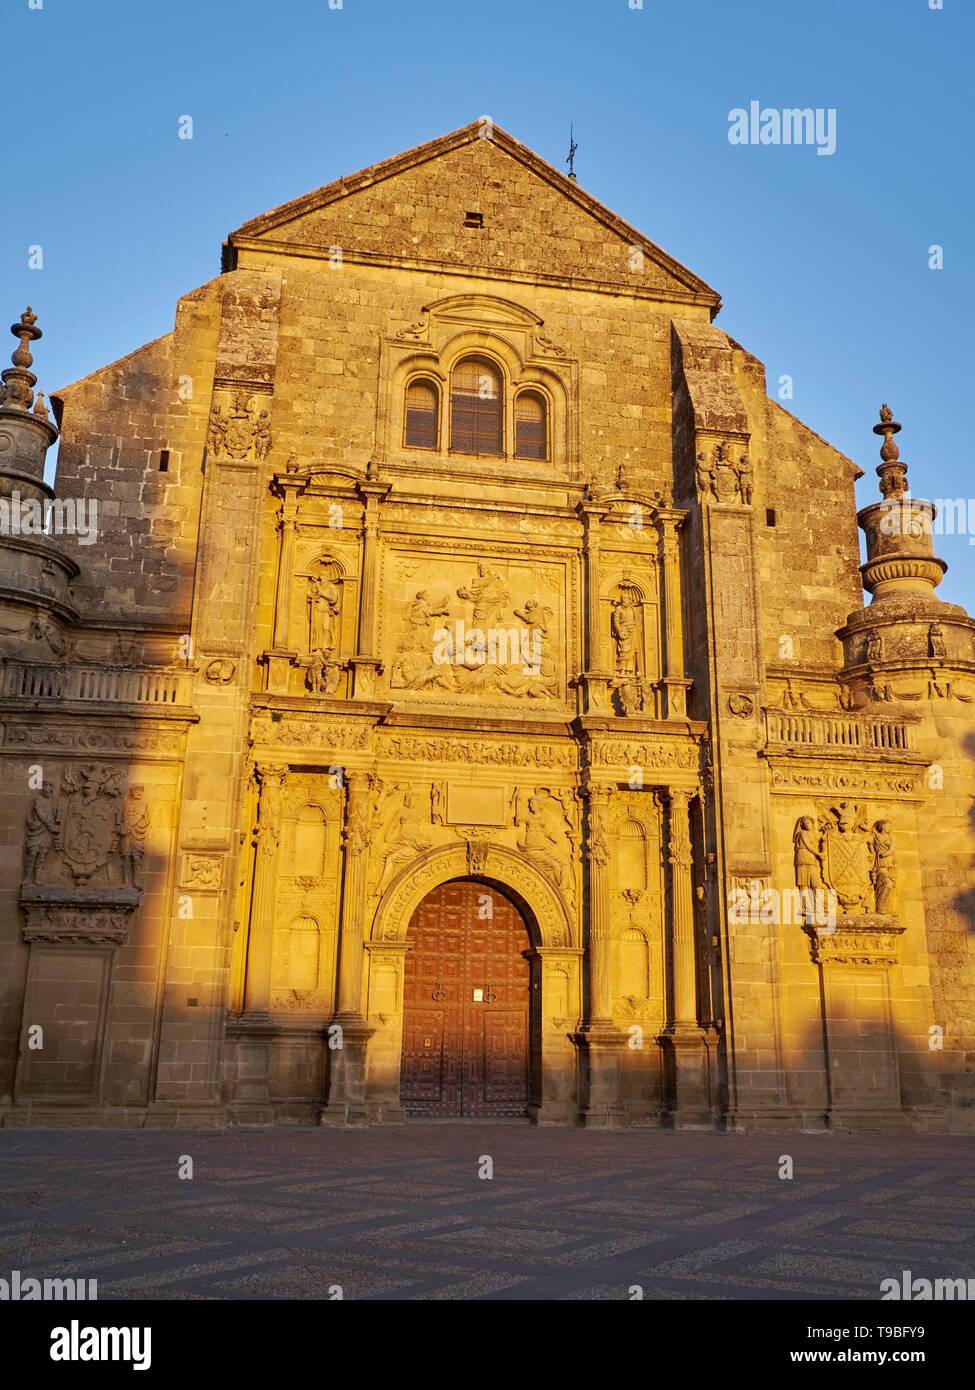 Church of El Salvador - Unesco World Heritage -. Úbeda, Jaén, Andalusia, Spain. Stock Photo